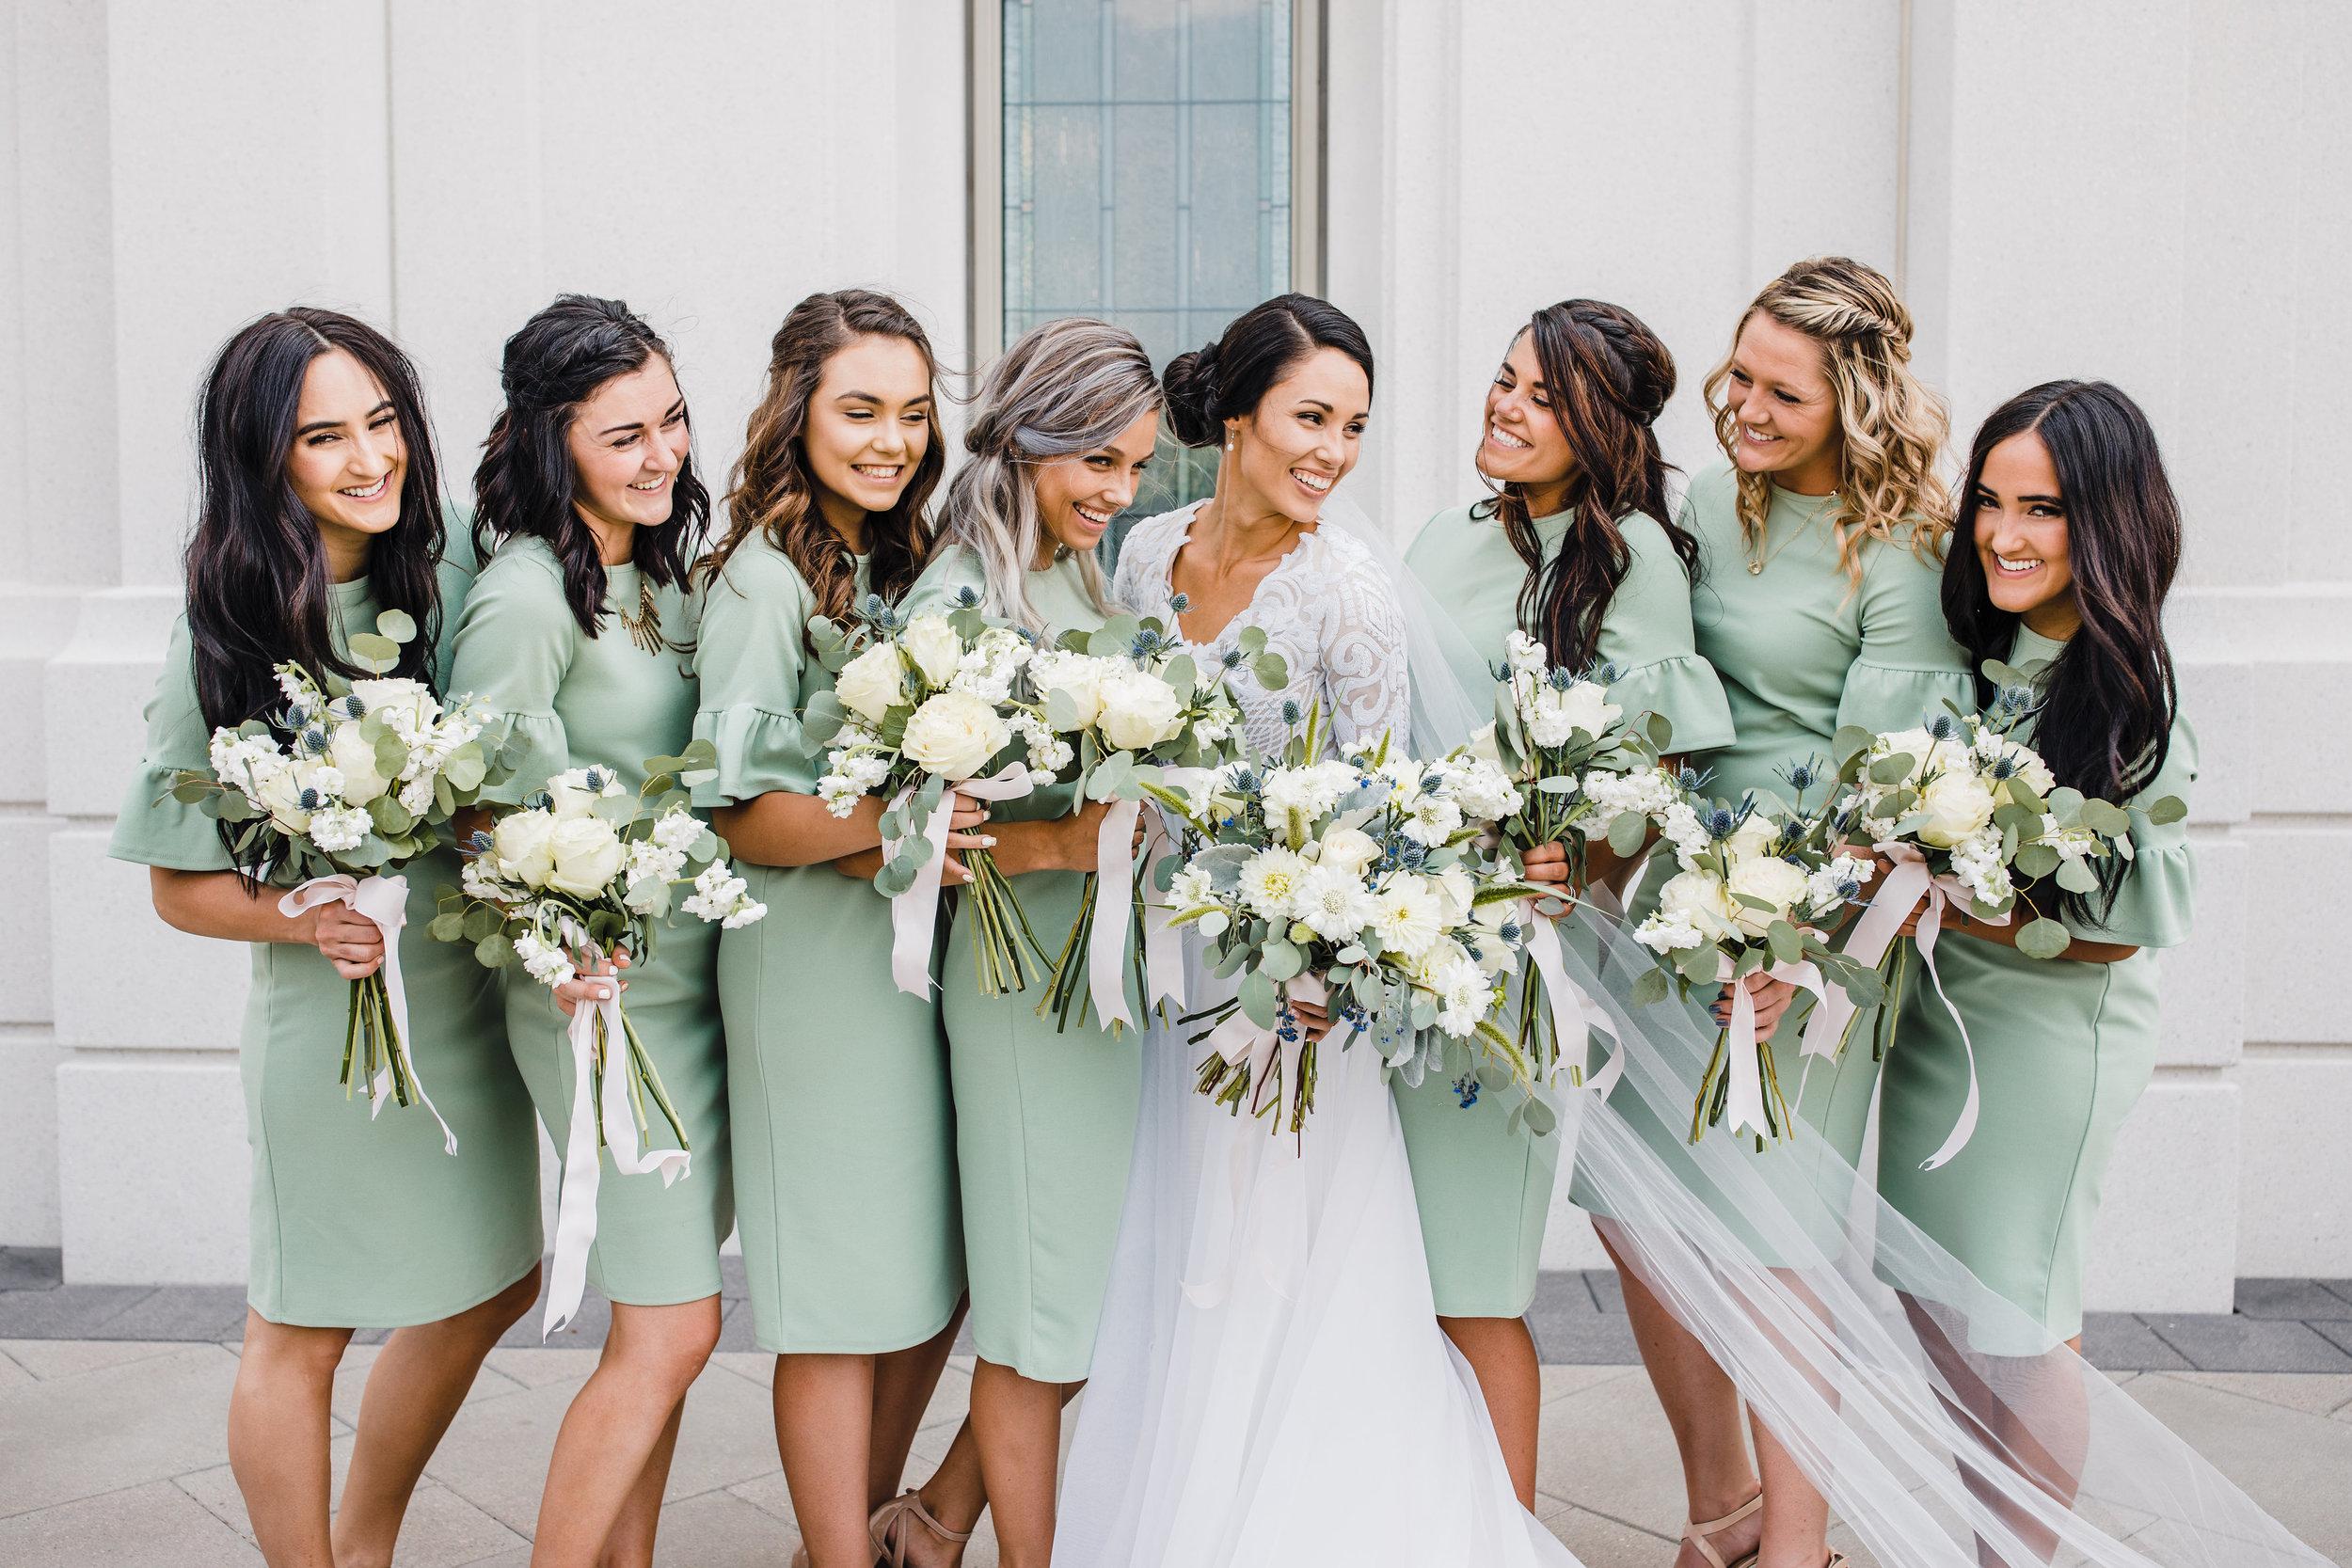 best brigham city utah wedding photographer green bridesmaids dresses white bouquets happy smiling bridal braids